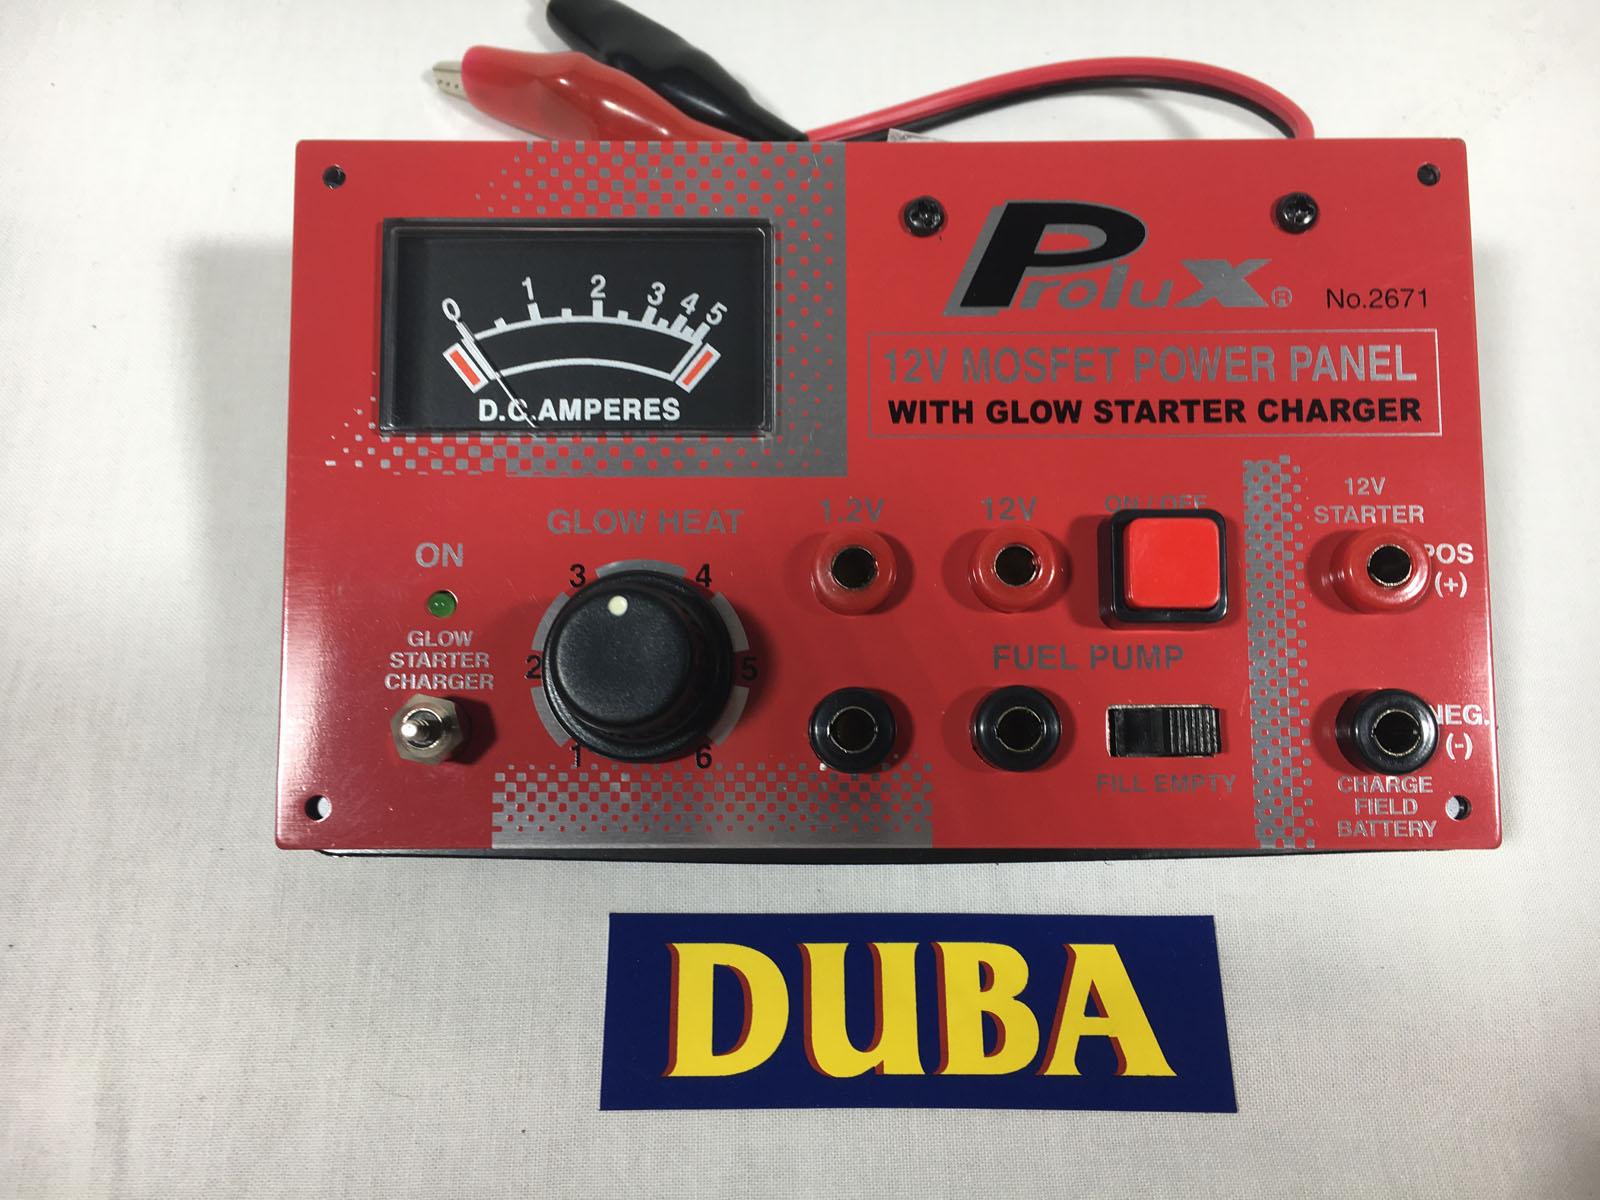 Power Panel 12v Prolux